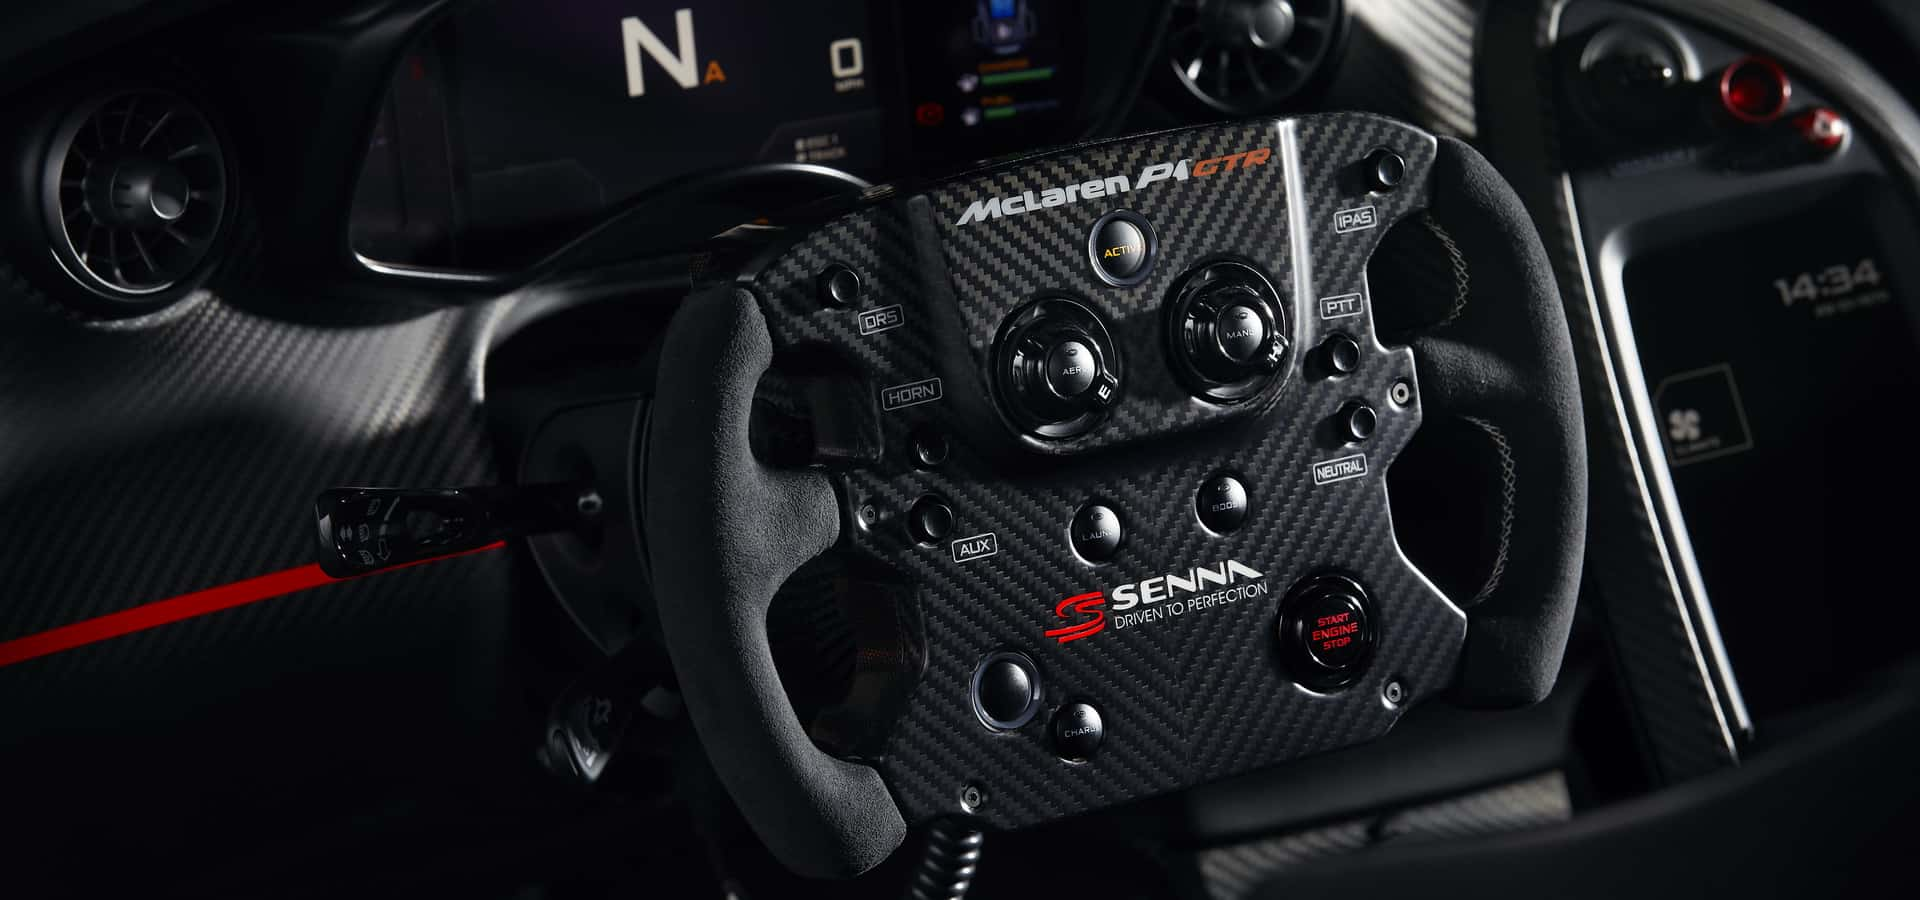 McLaren-P1-GTR-MSO-Senna-9